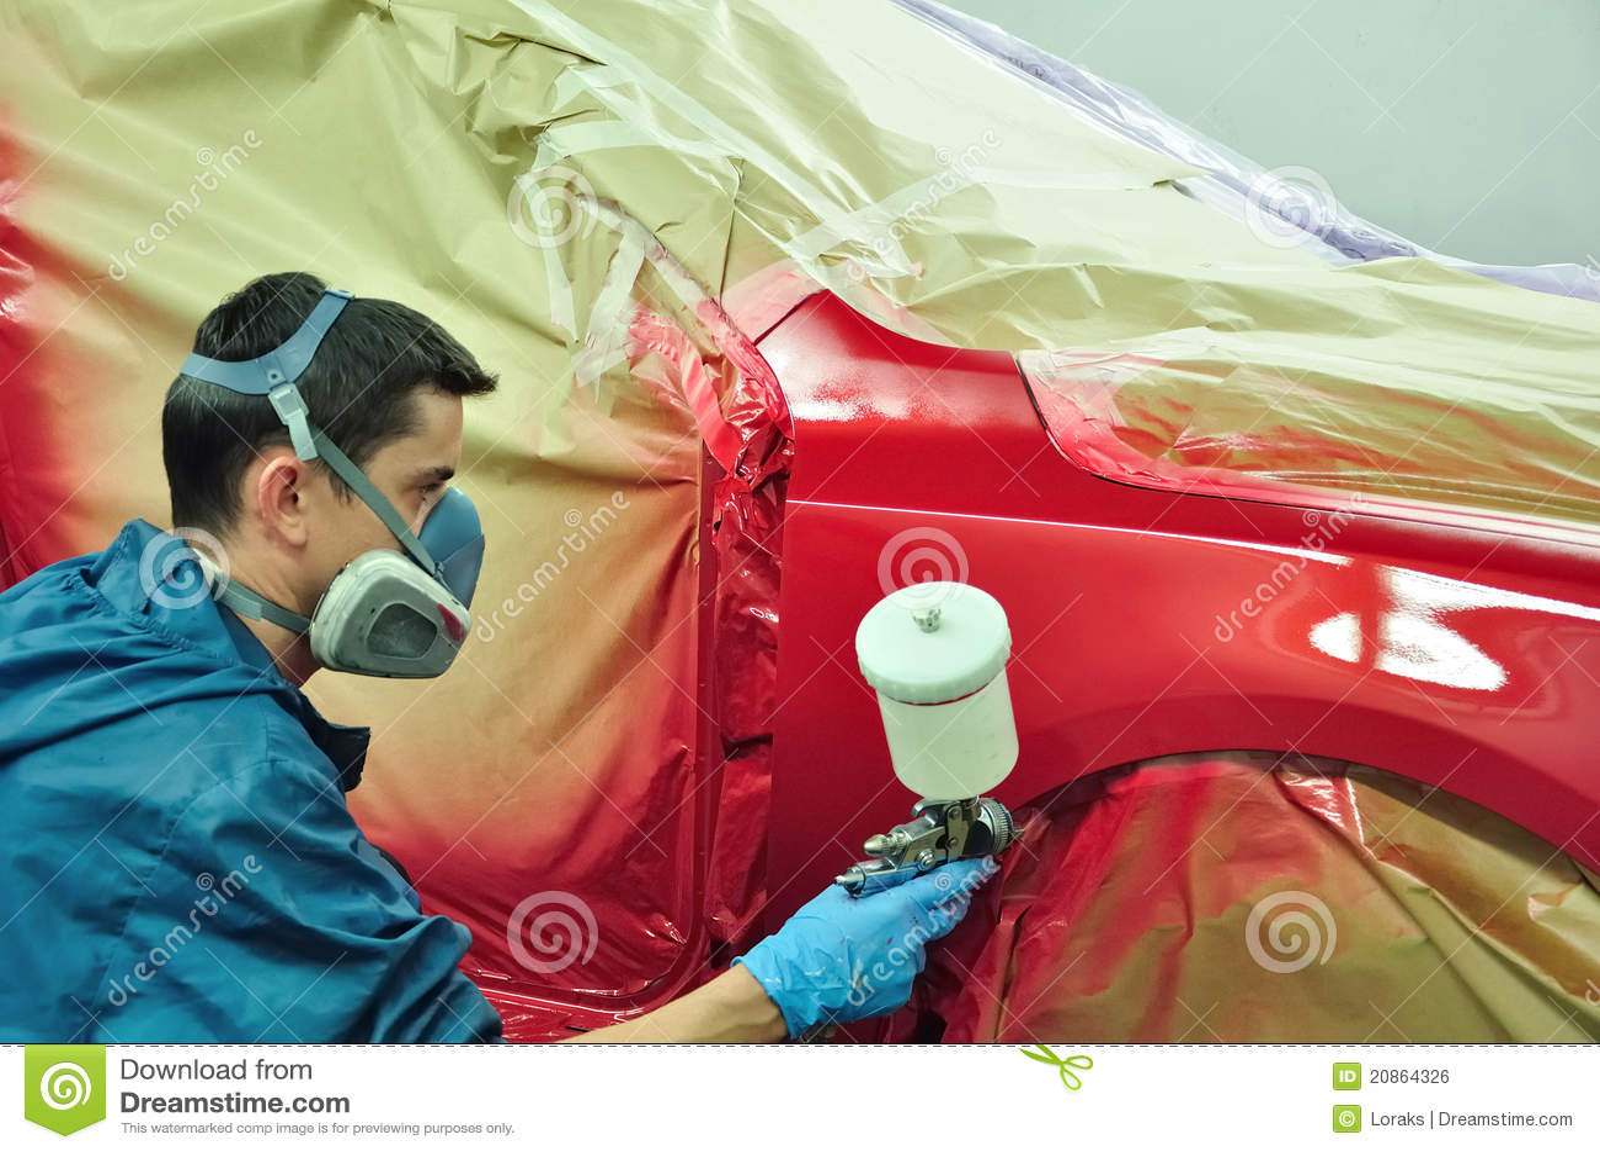 Видео покрасить авто своими руками фото